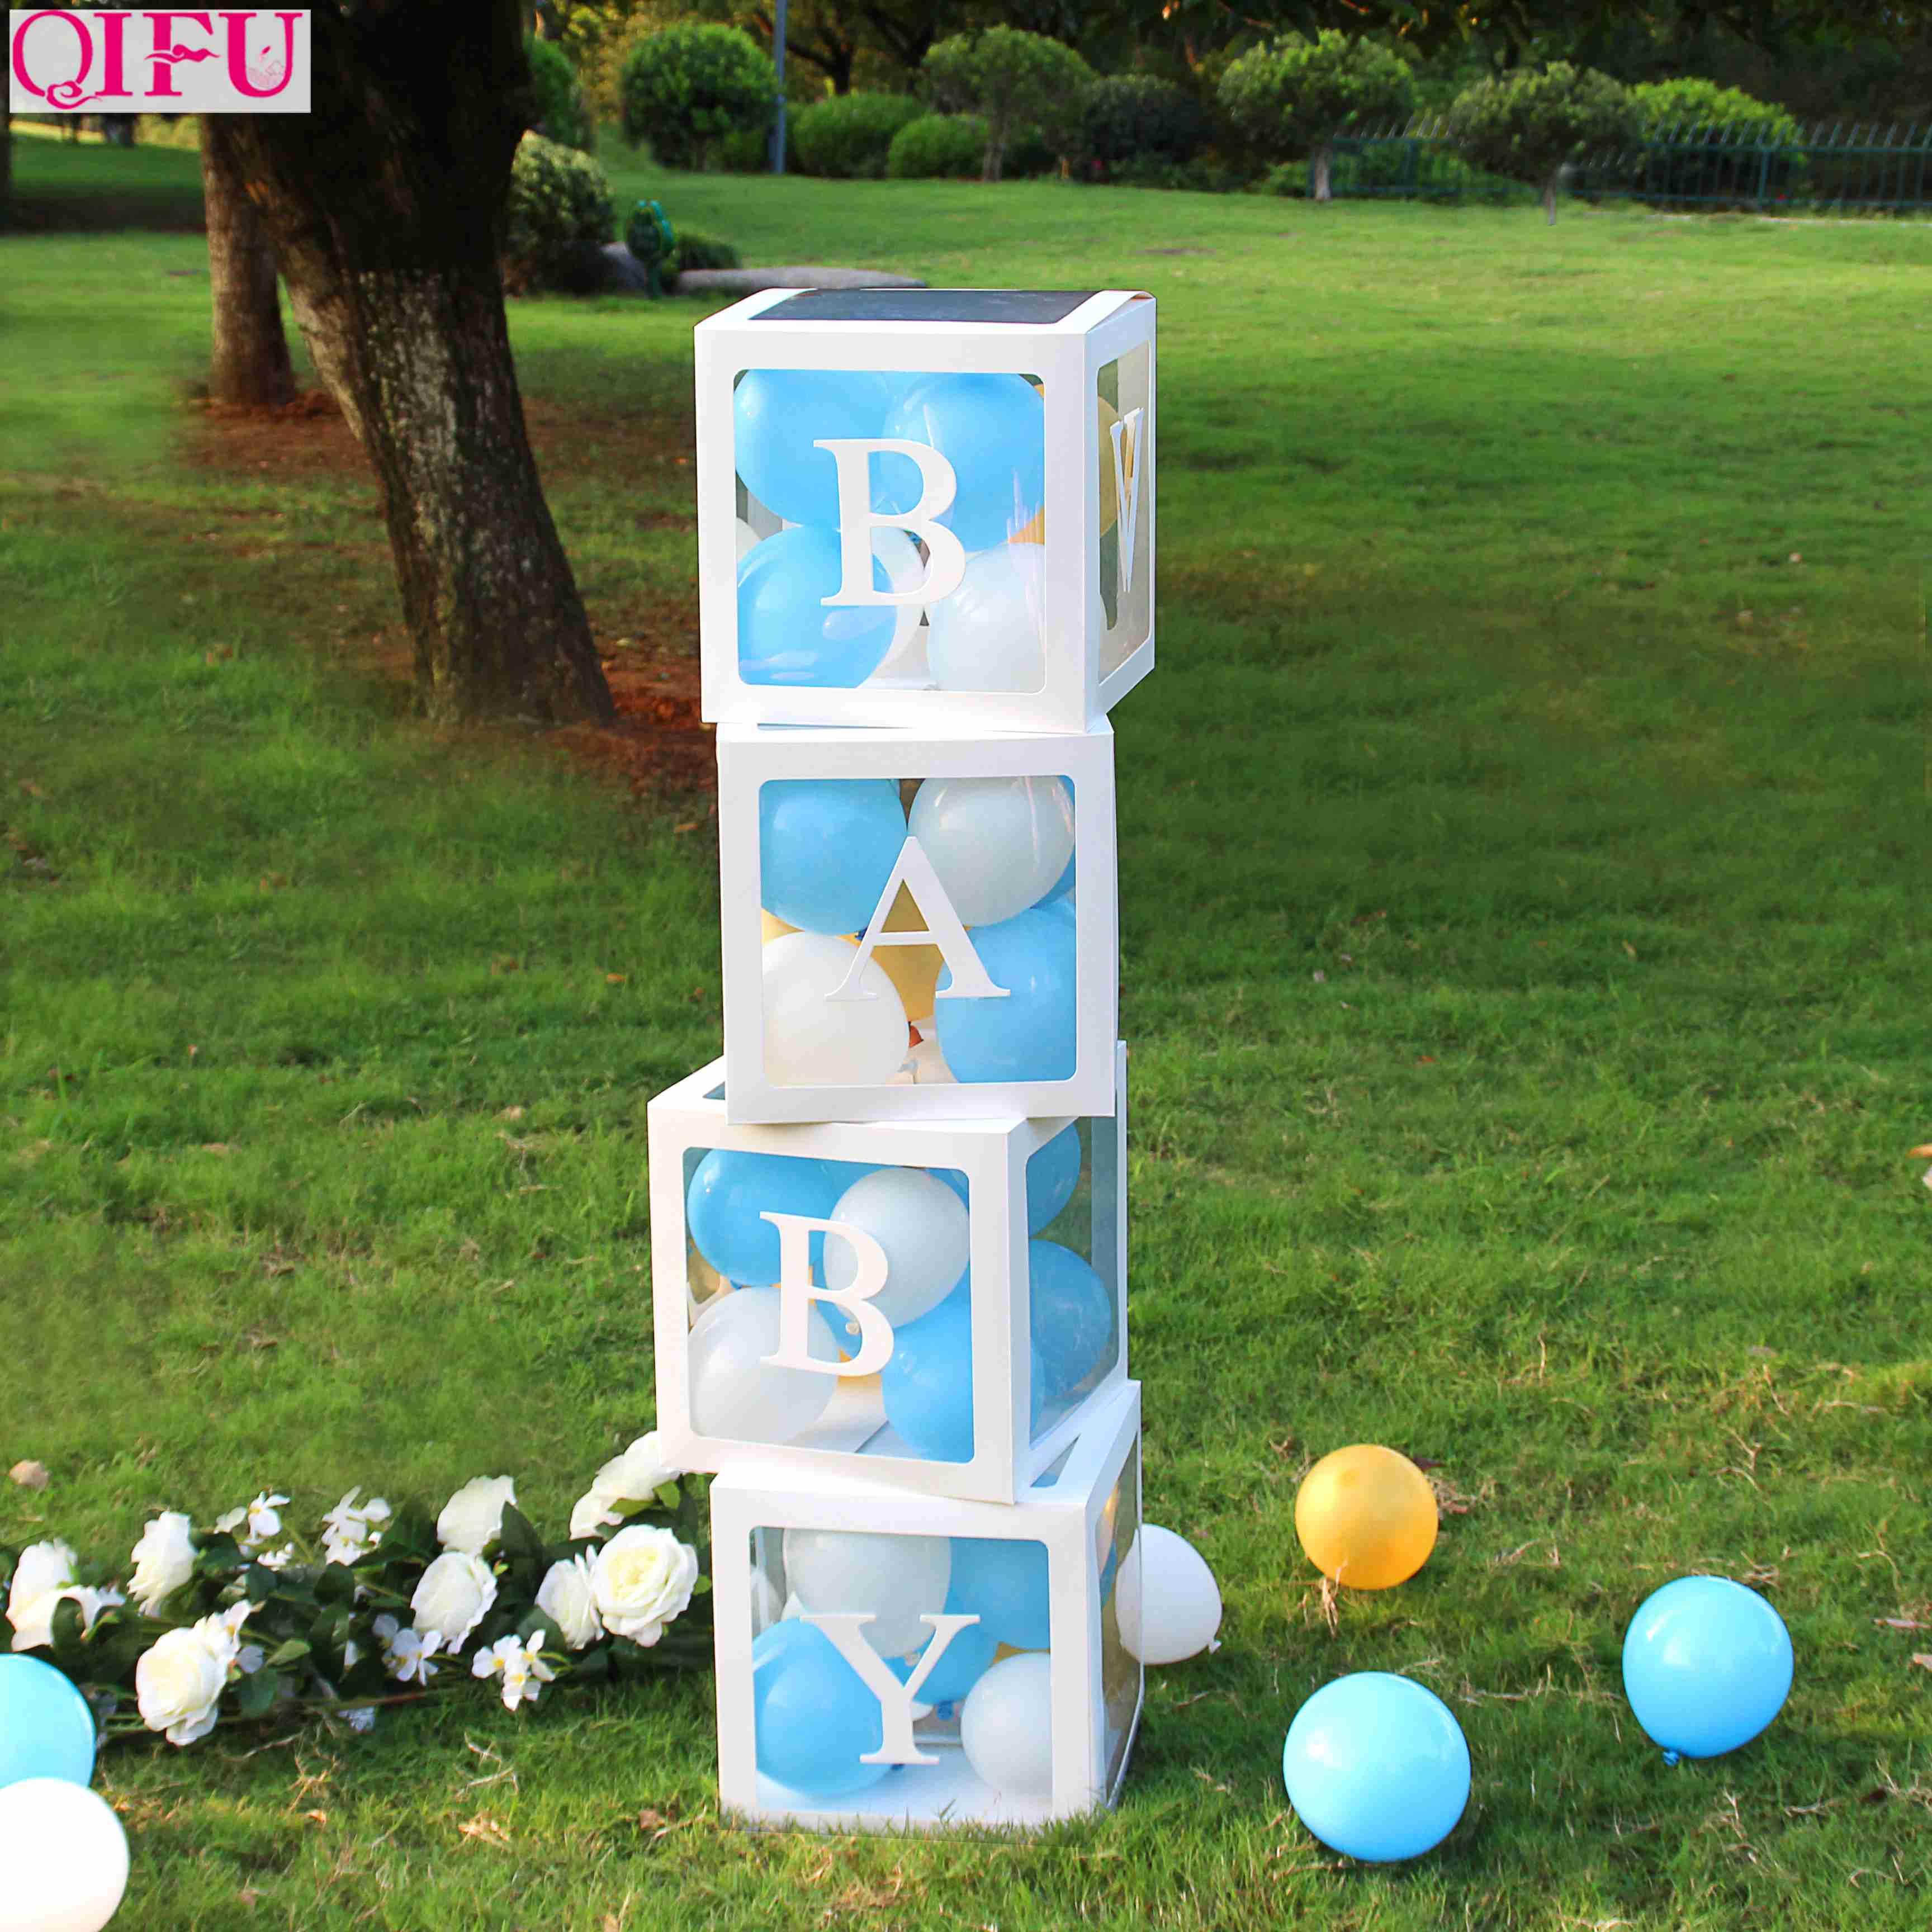 QIFU Alphabet Transparent Box Baby Shower Boy Girl Decoration Christening First Birthday Party Decor Babyshower Party Supplies